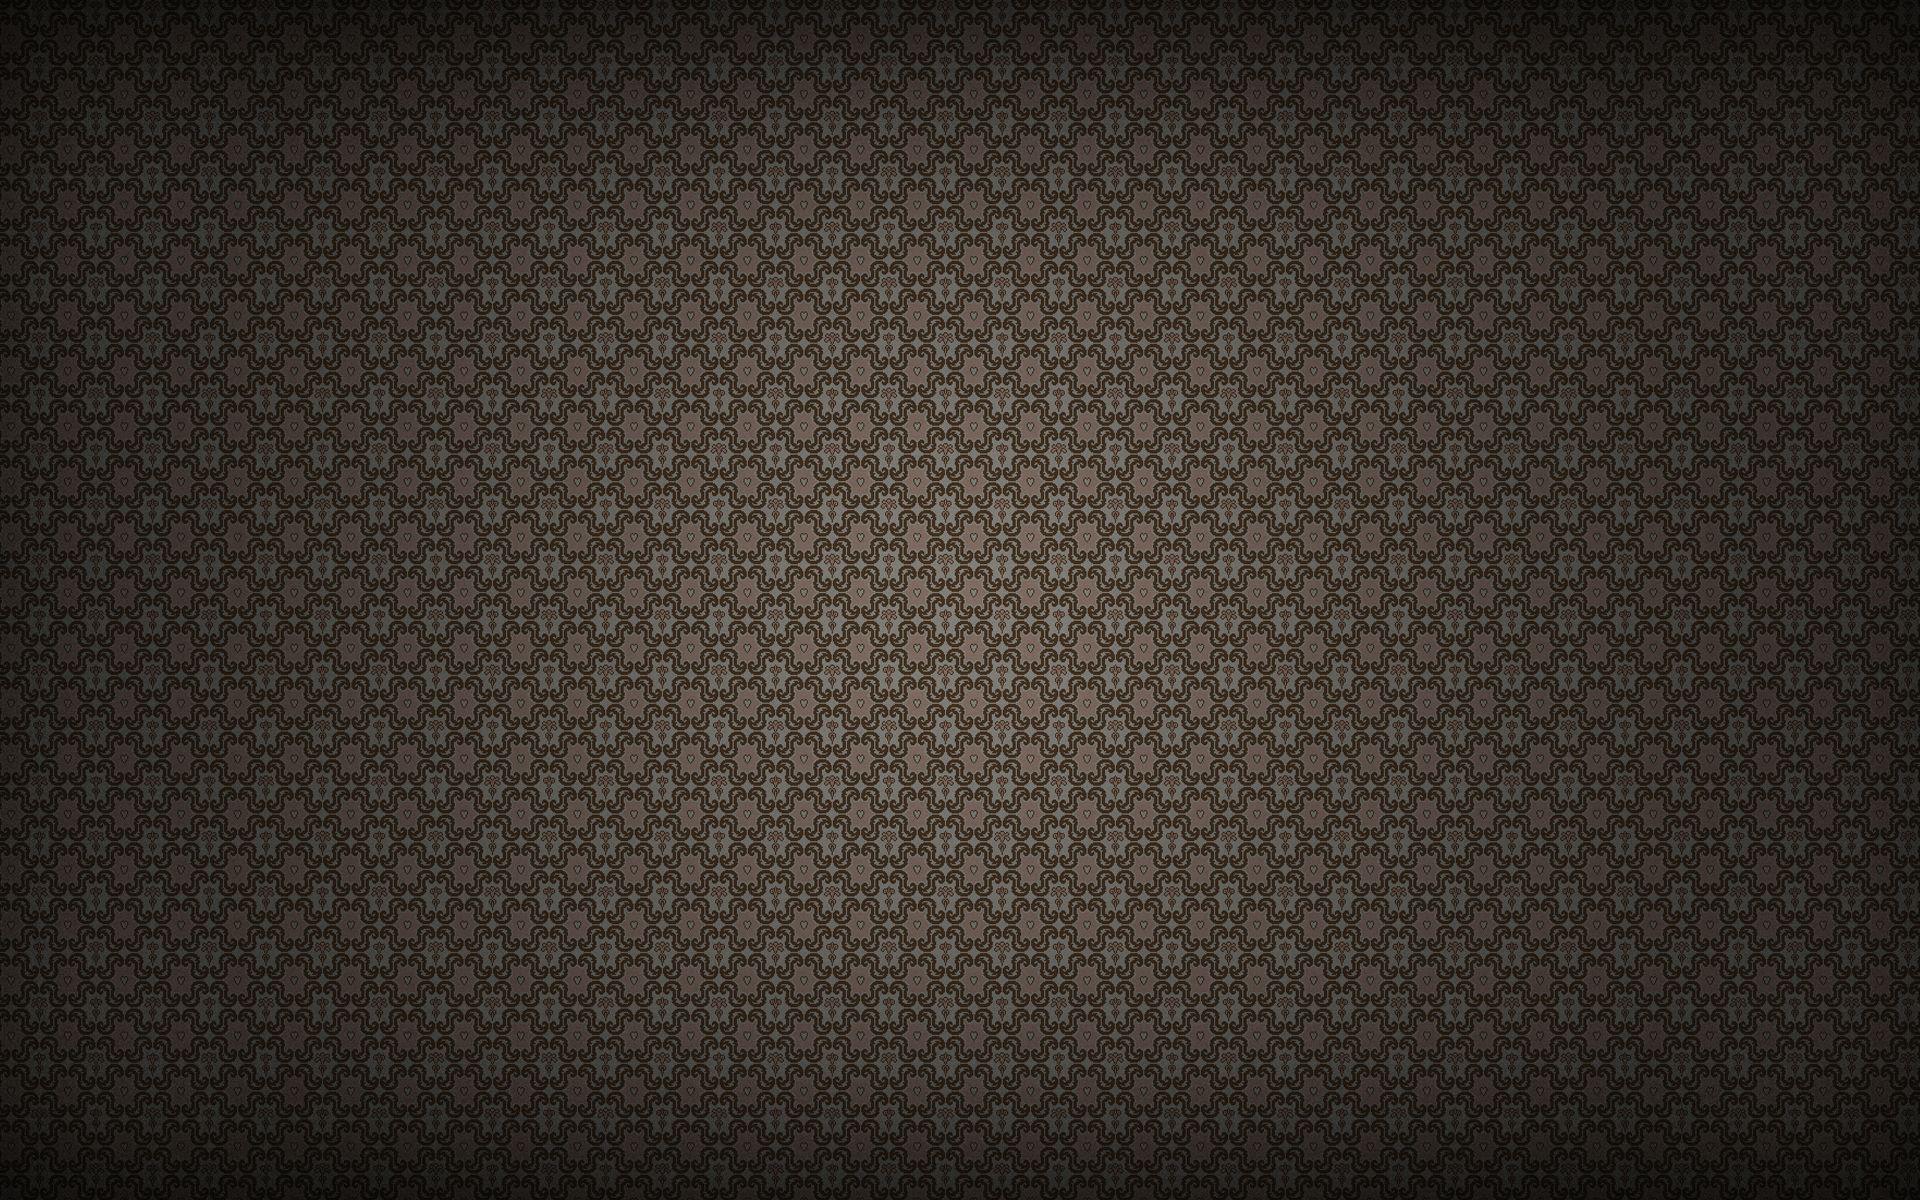 Hd Texture Backgroundspopular Hd Texture Backgrounds